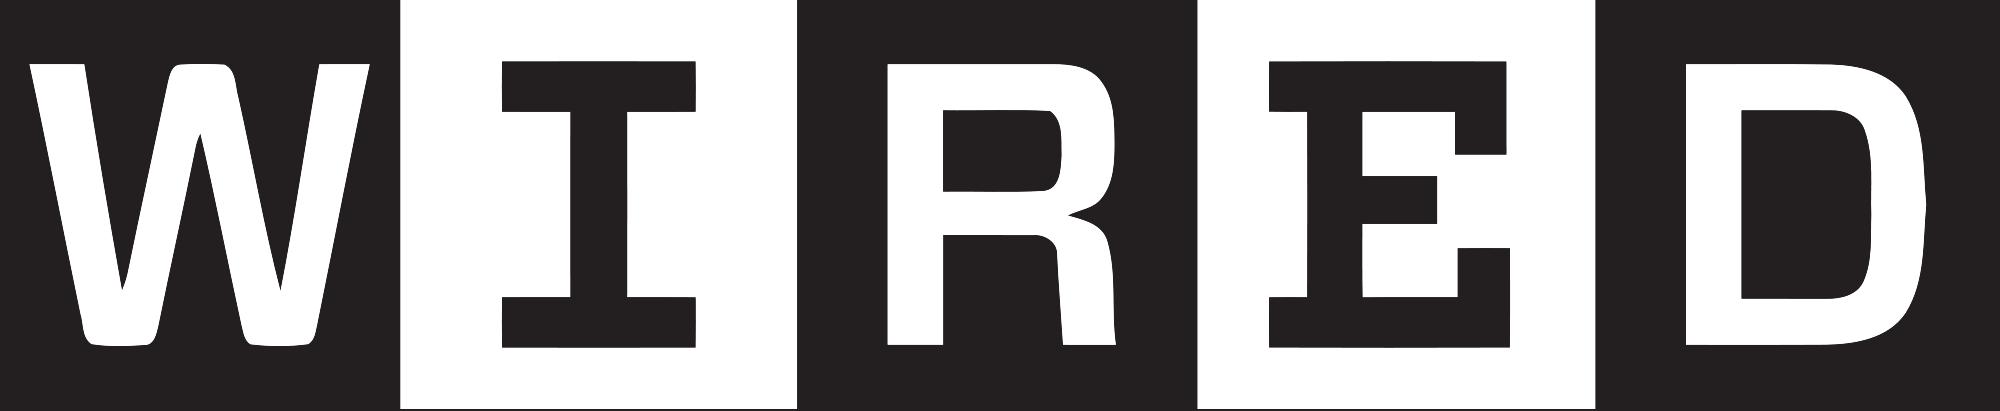 Wired.com Logo